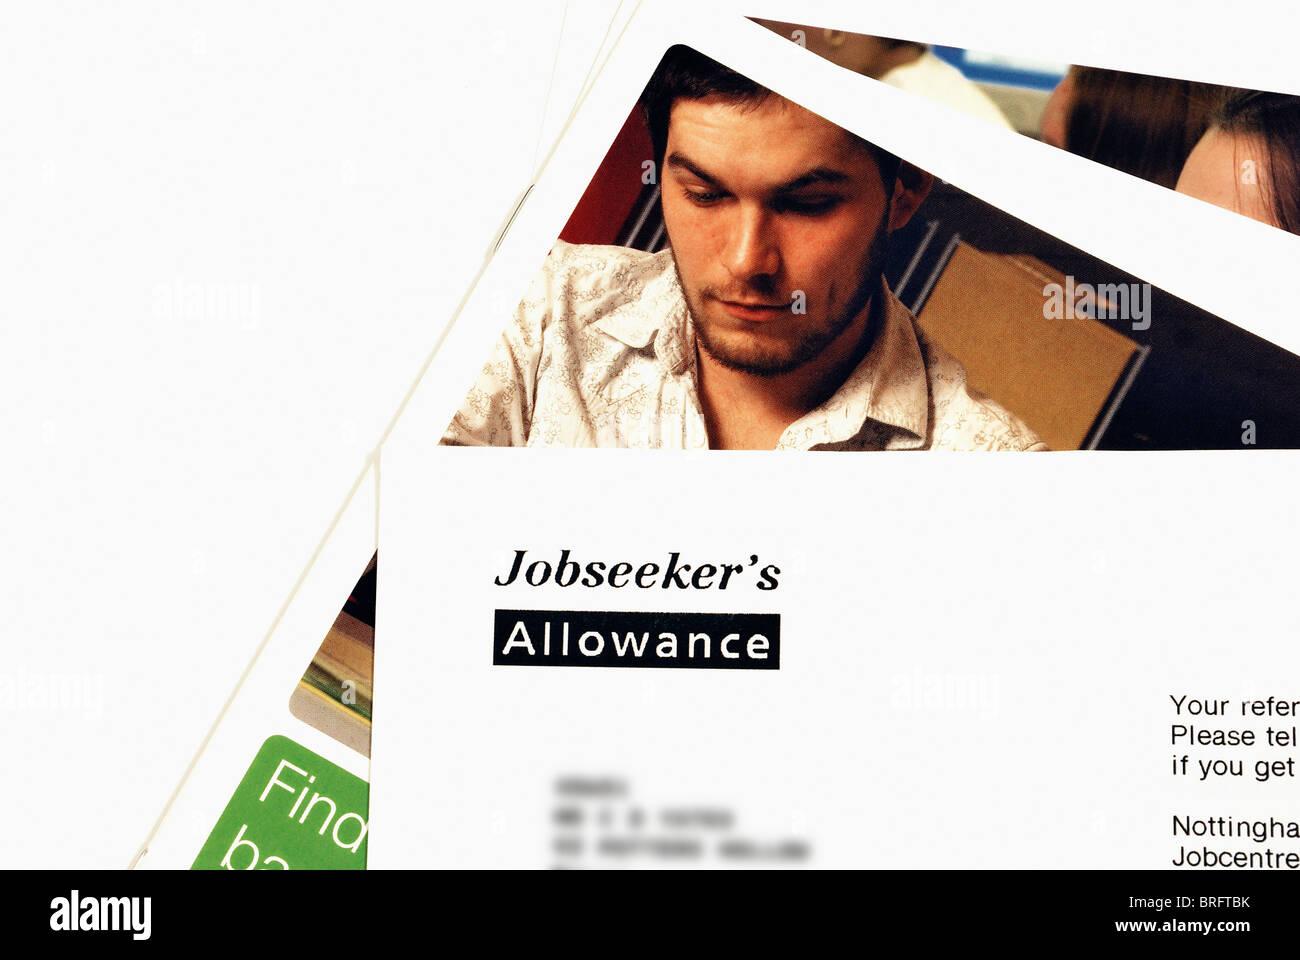 job seekers stock photos job seekers stock images alamy jobseekers allowance letter england uk stock image